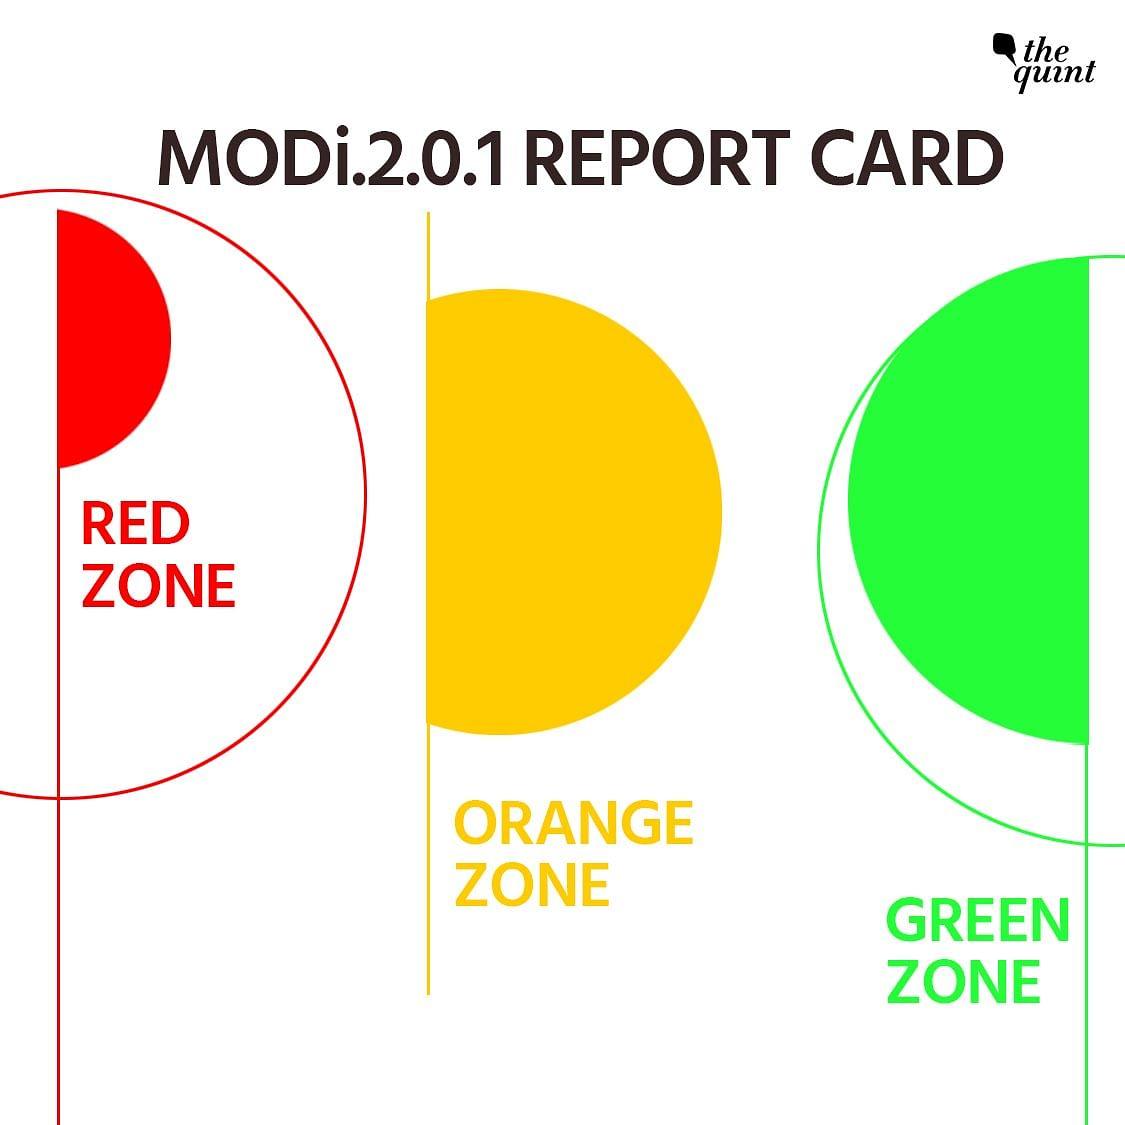 MODi 2.0.1 Report Card – The Red, Orange and Green Zones.